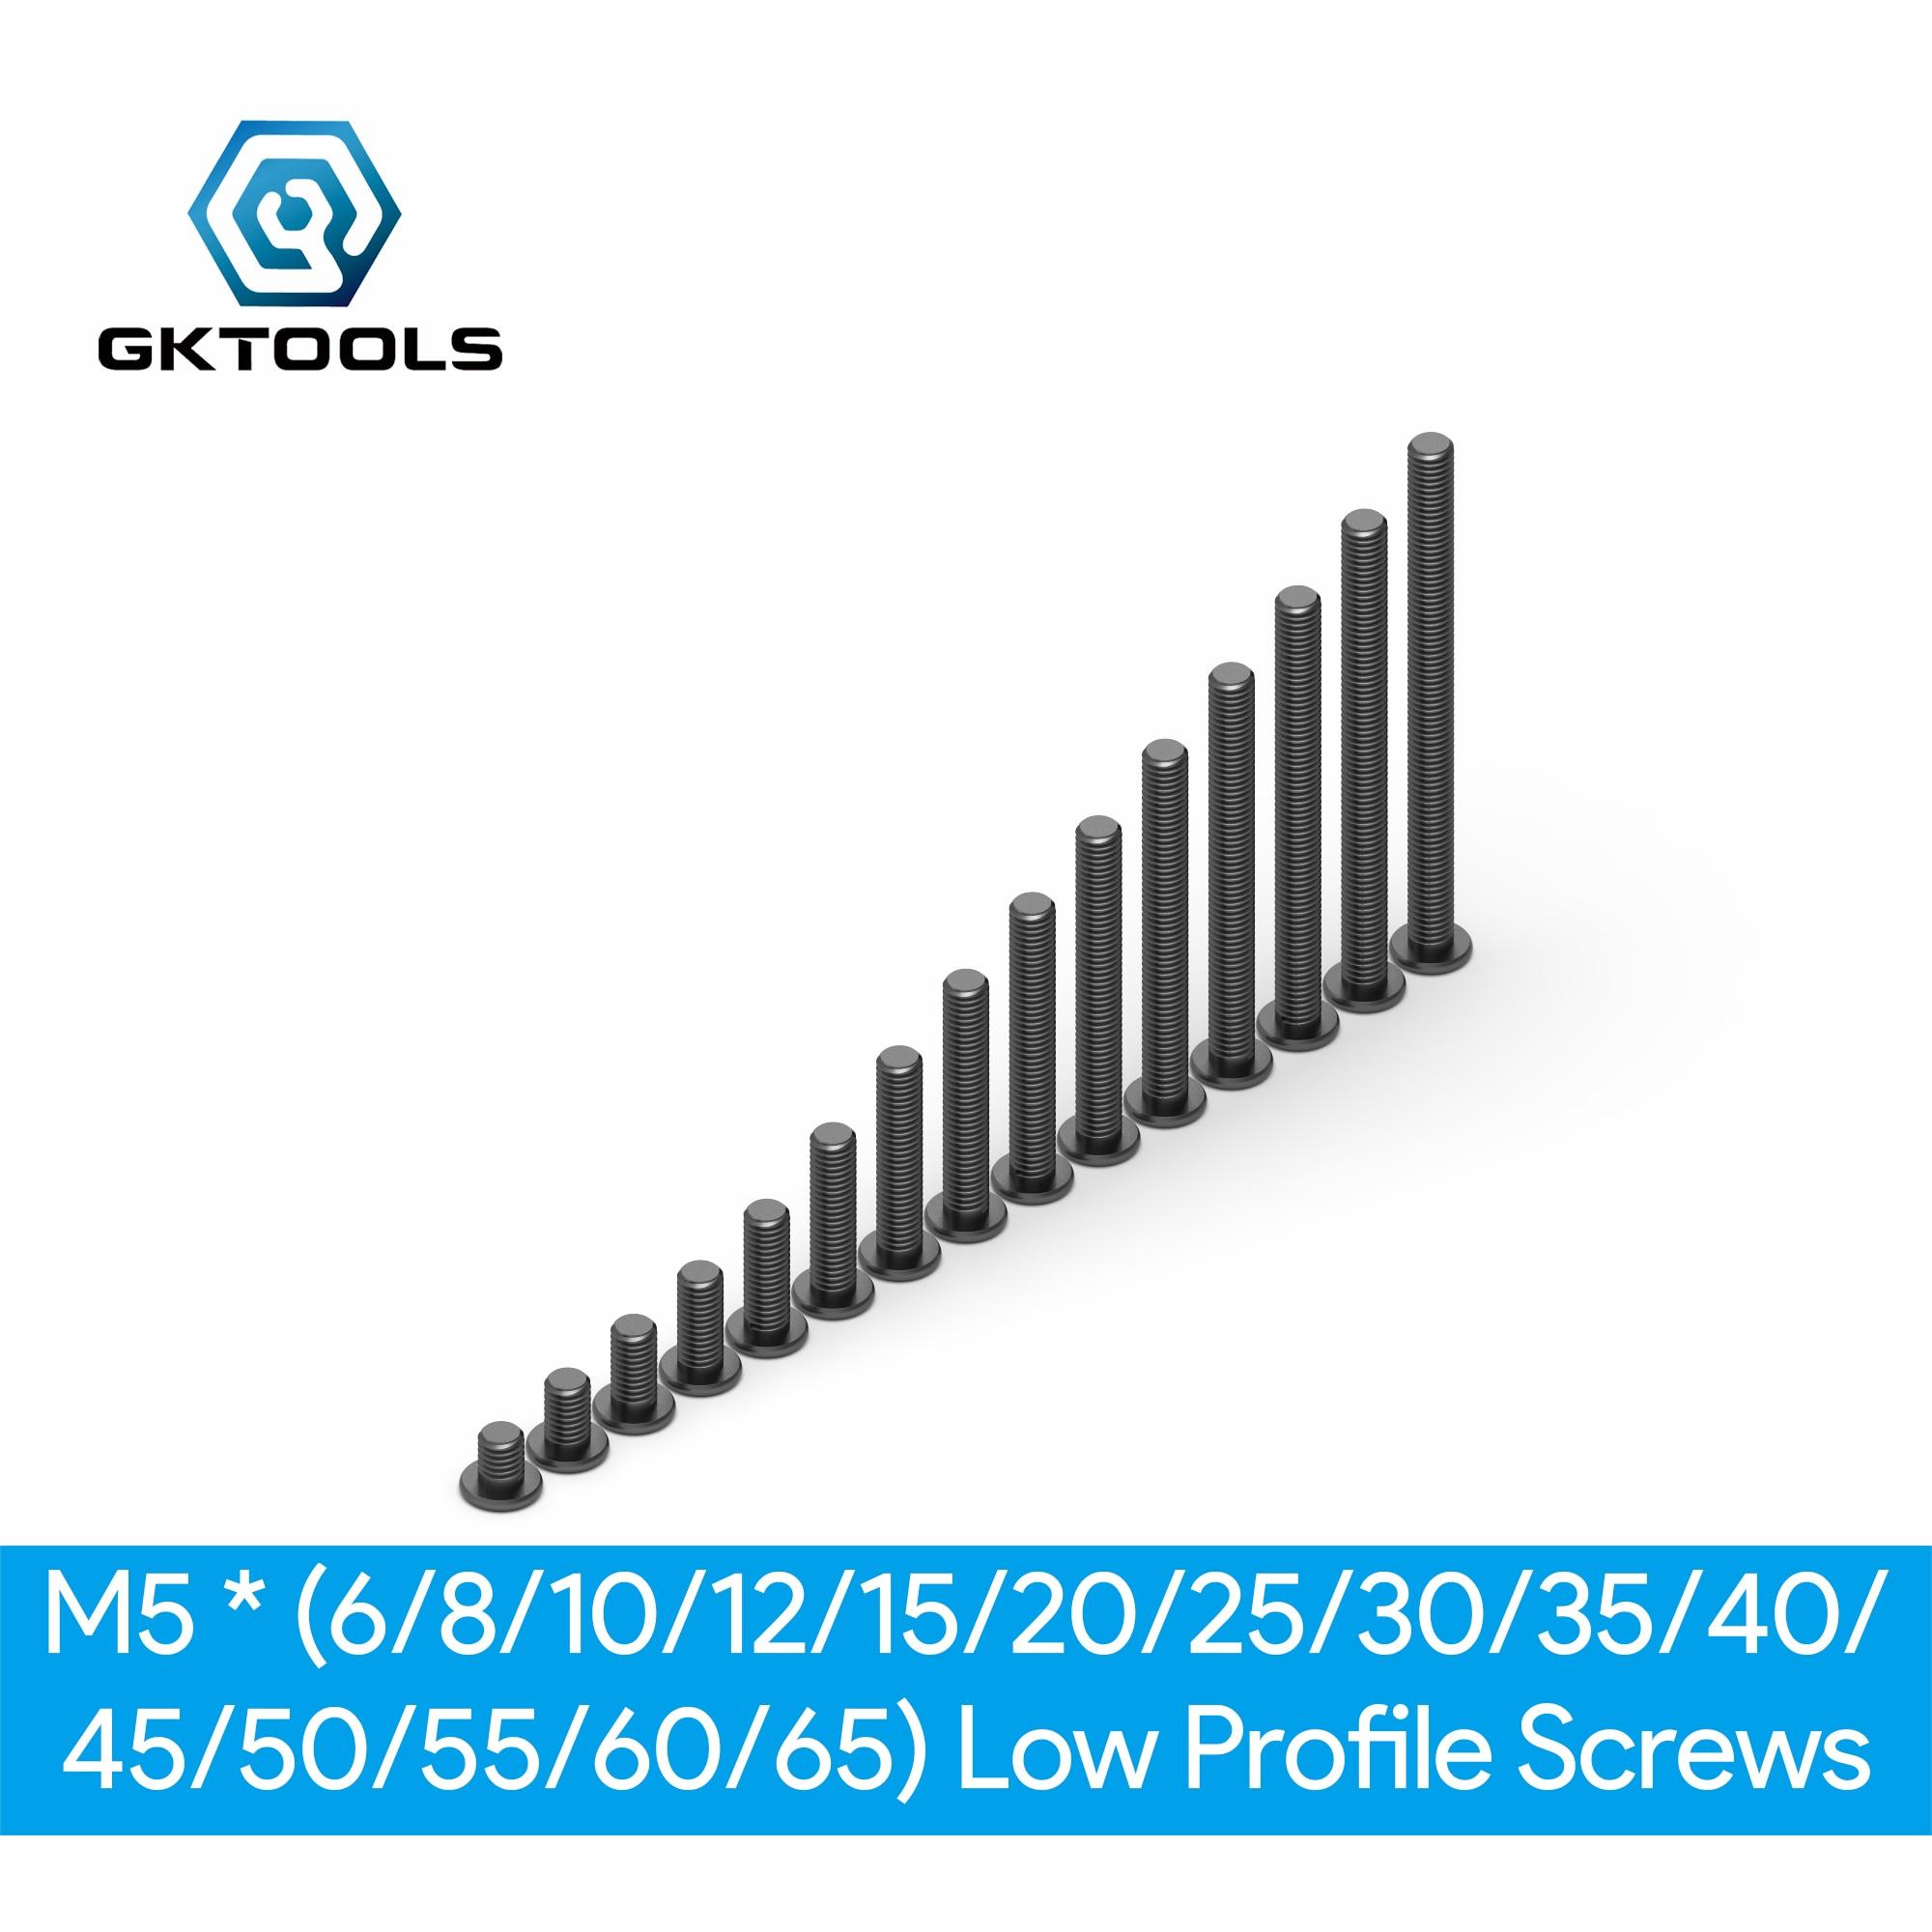 Openbuilds parafusos de perfil baixo m5